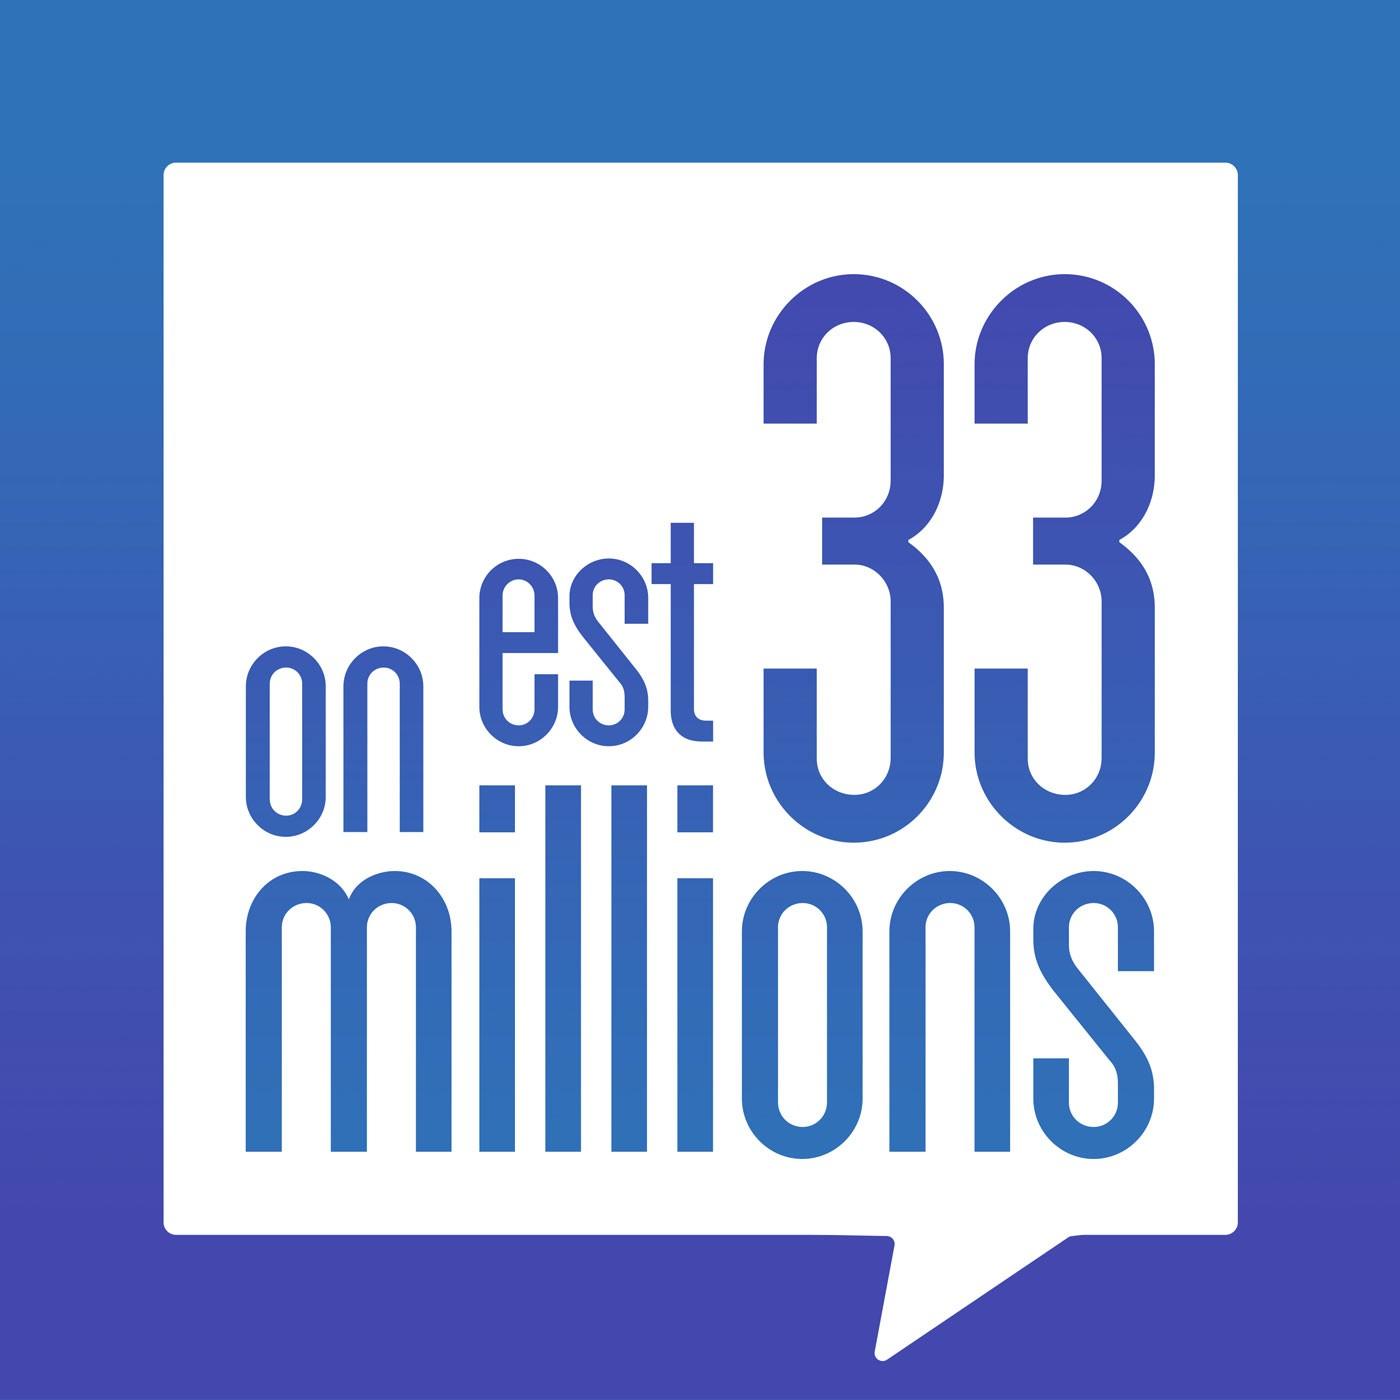 On est 33 millions